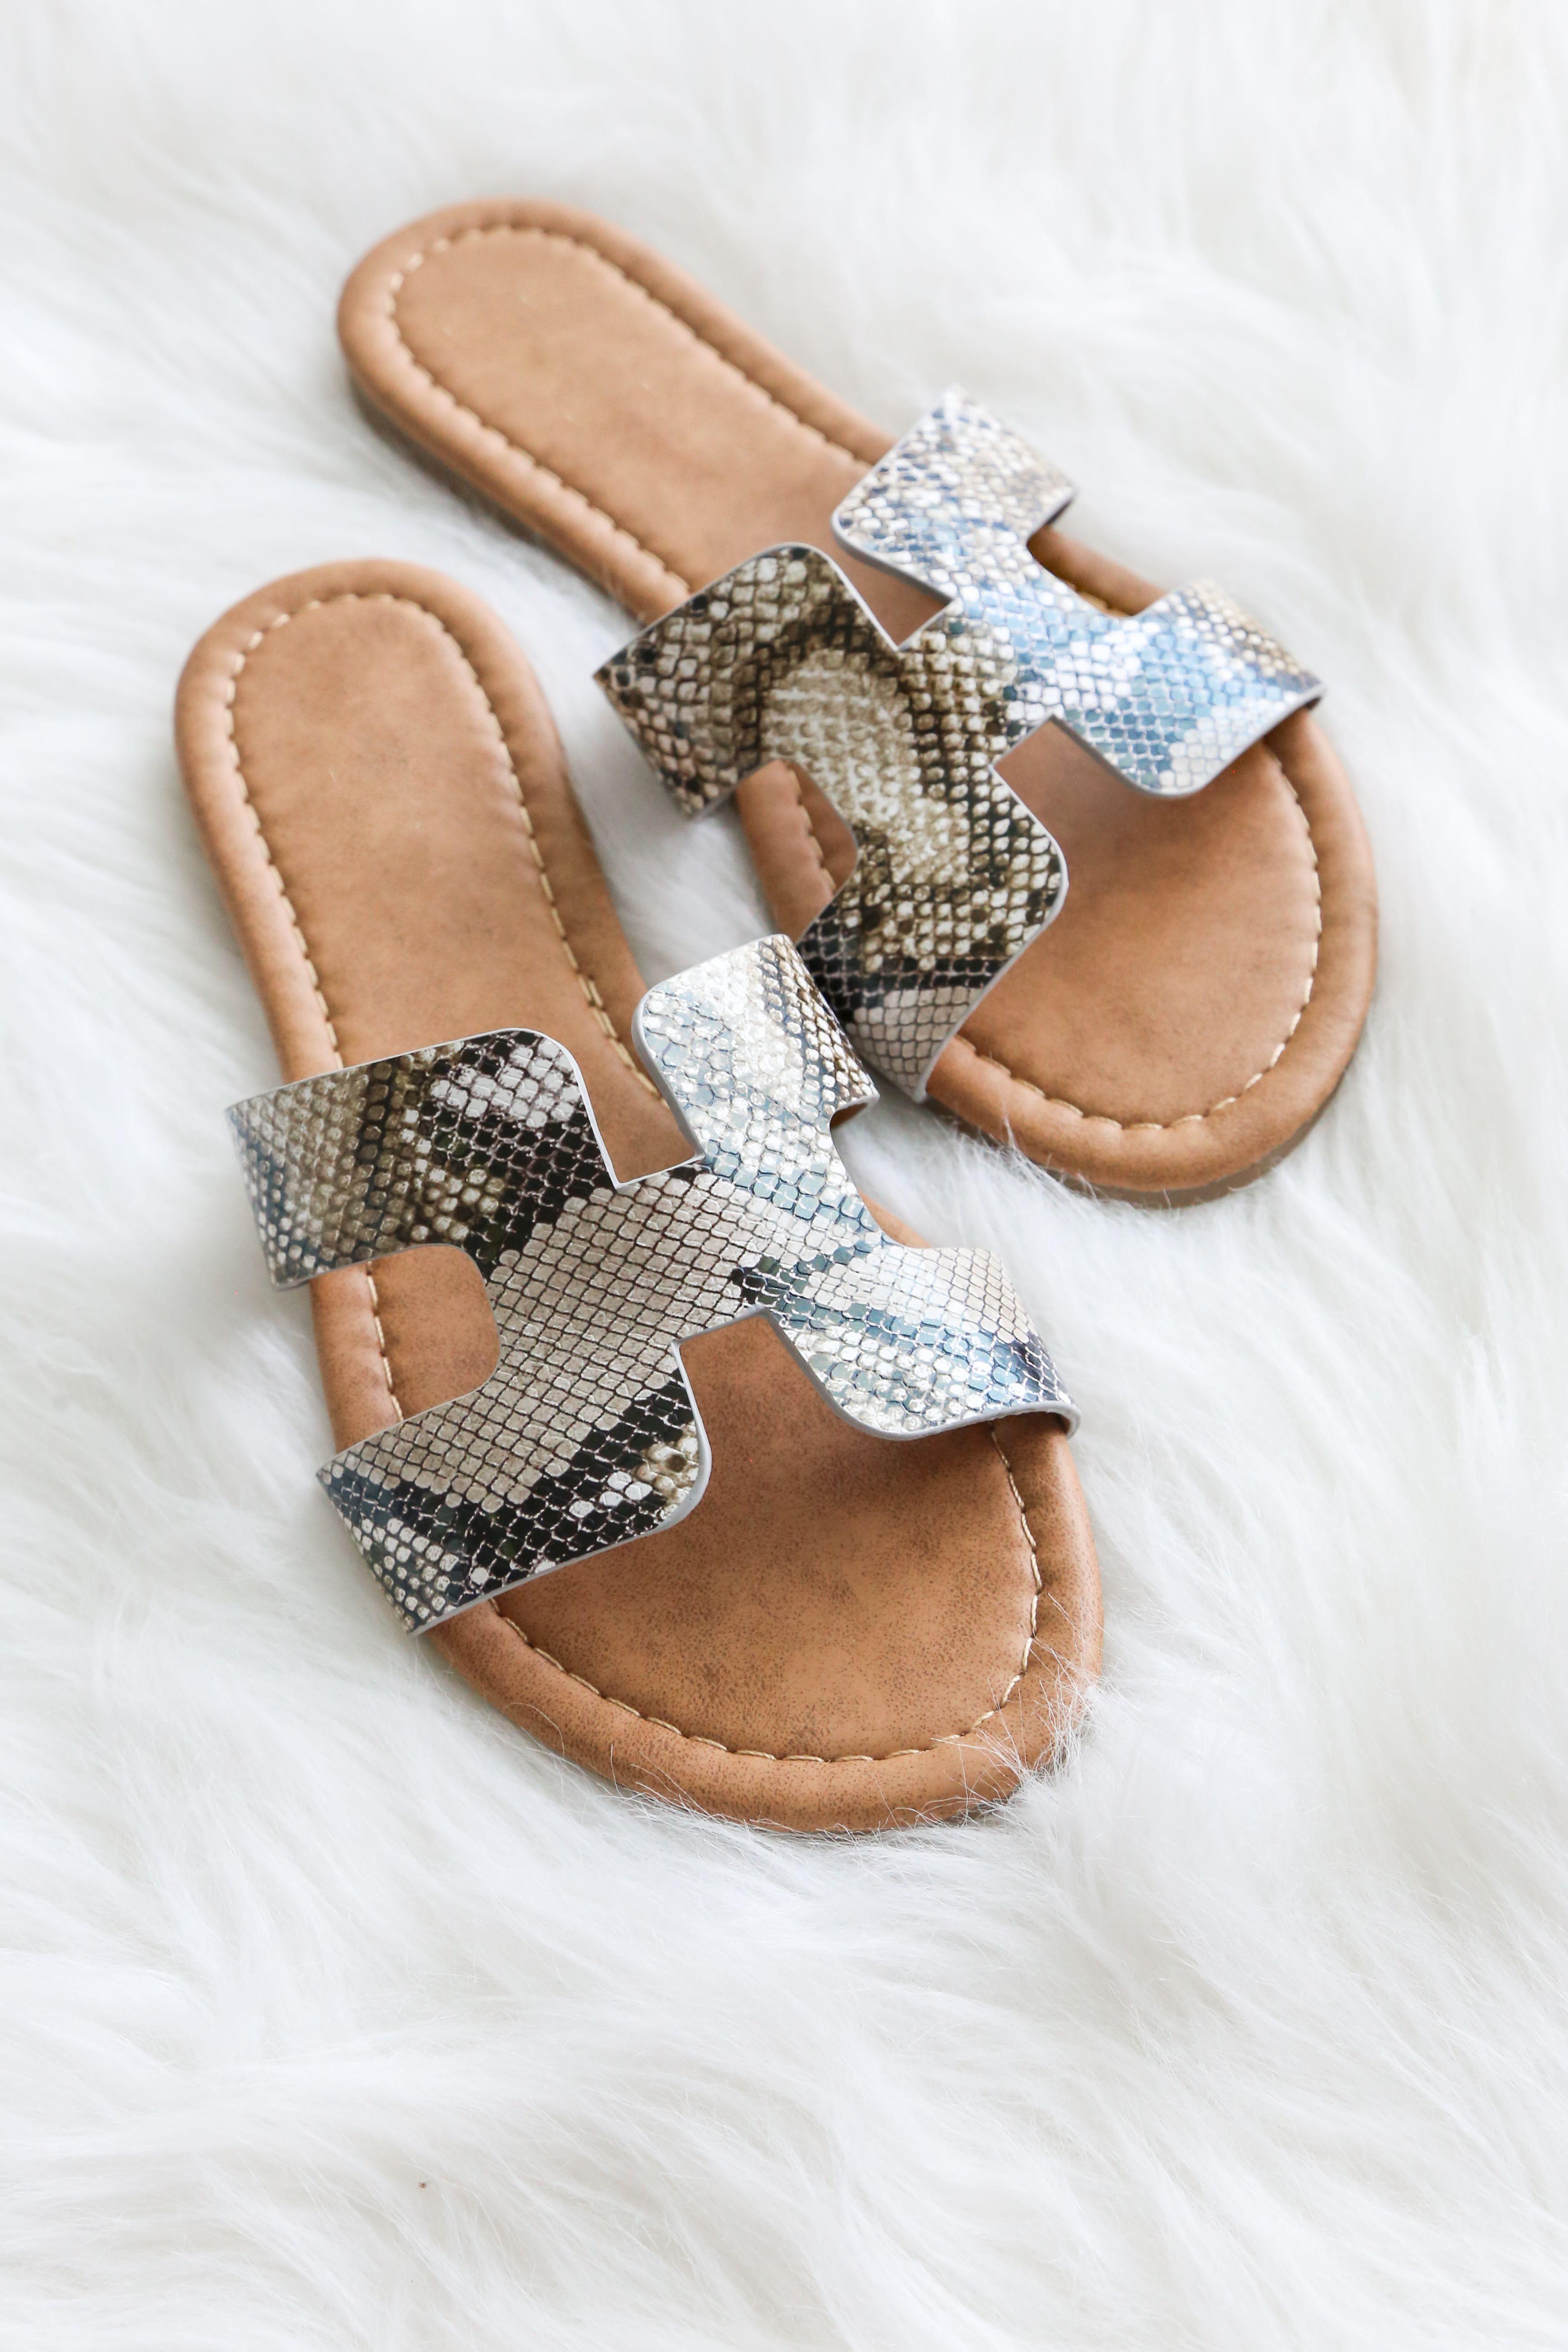 Snakeskin sandals | Snake skin shoes